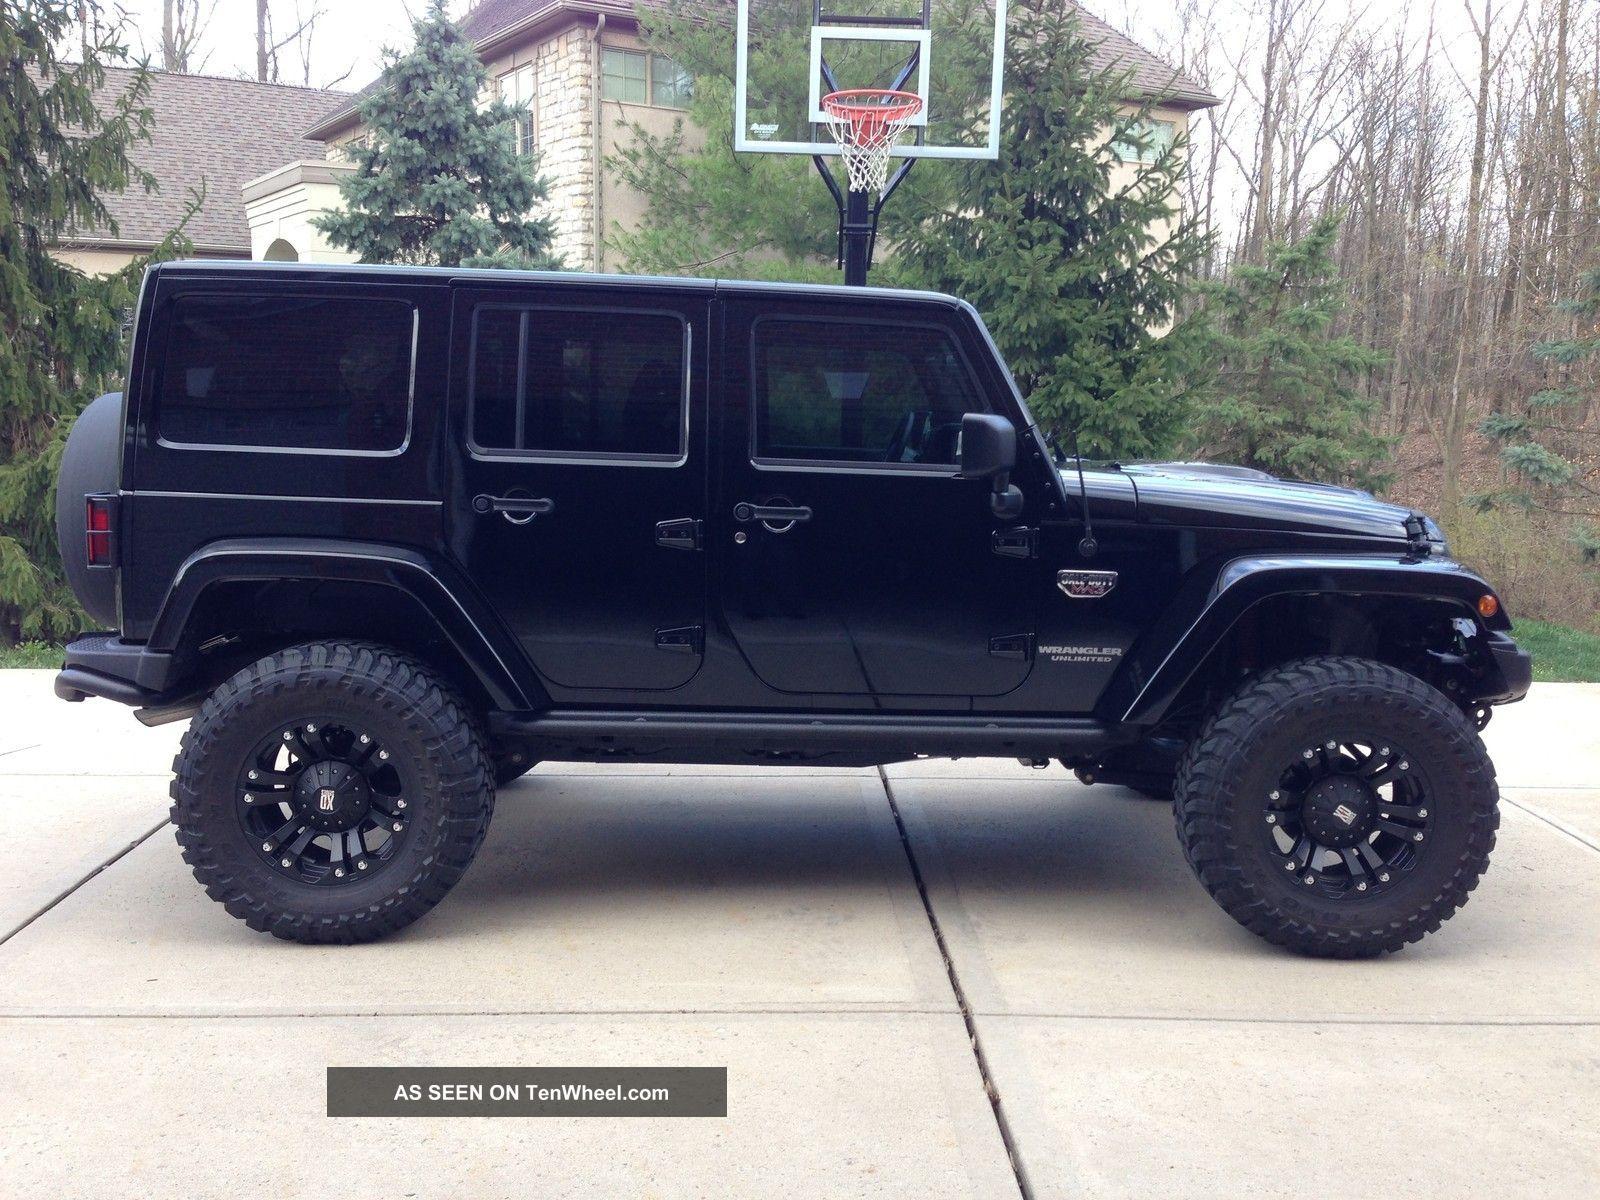 Black Jeep Wrangler 4 Door. dream car Goals Pinterest